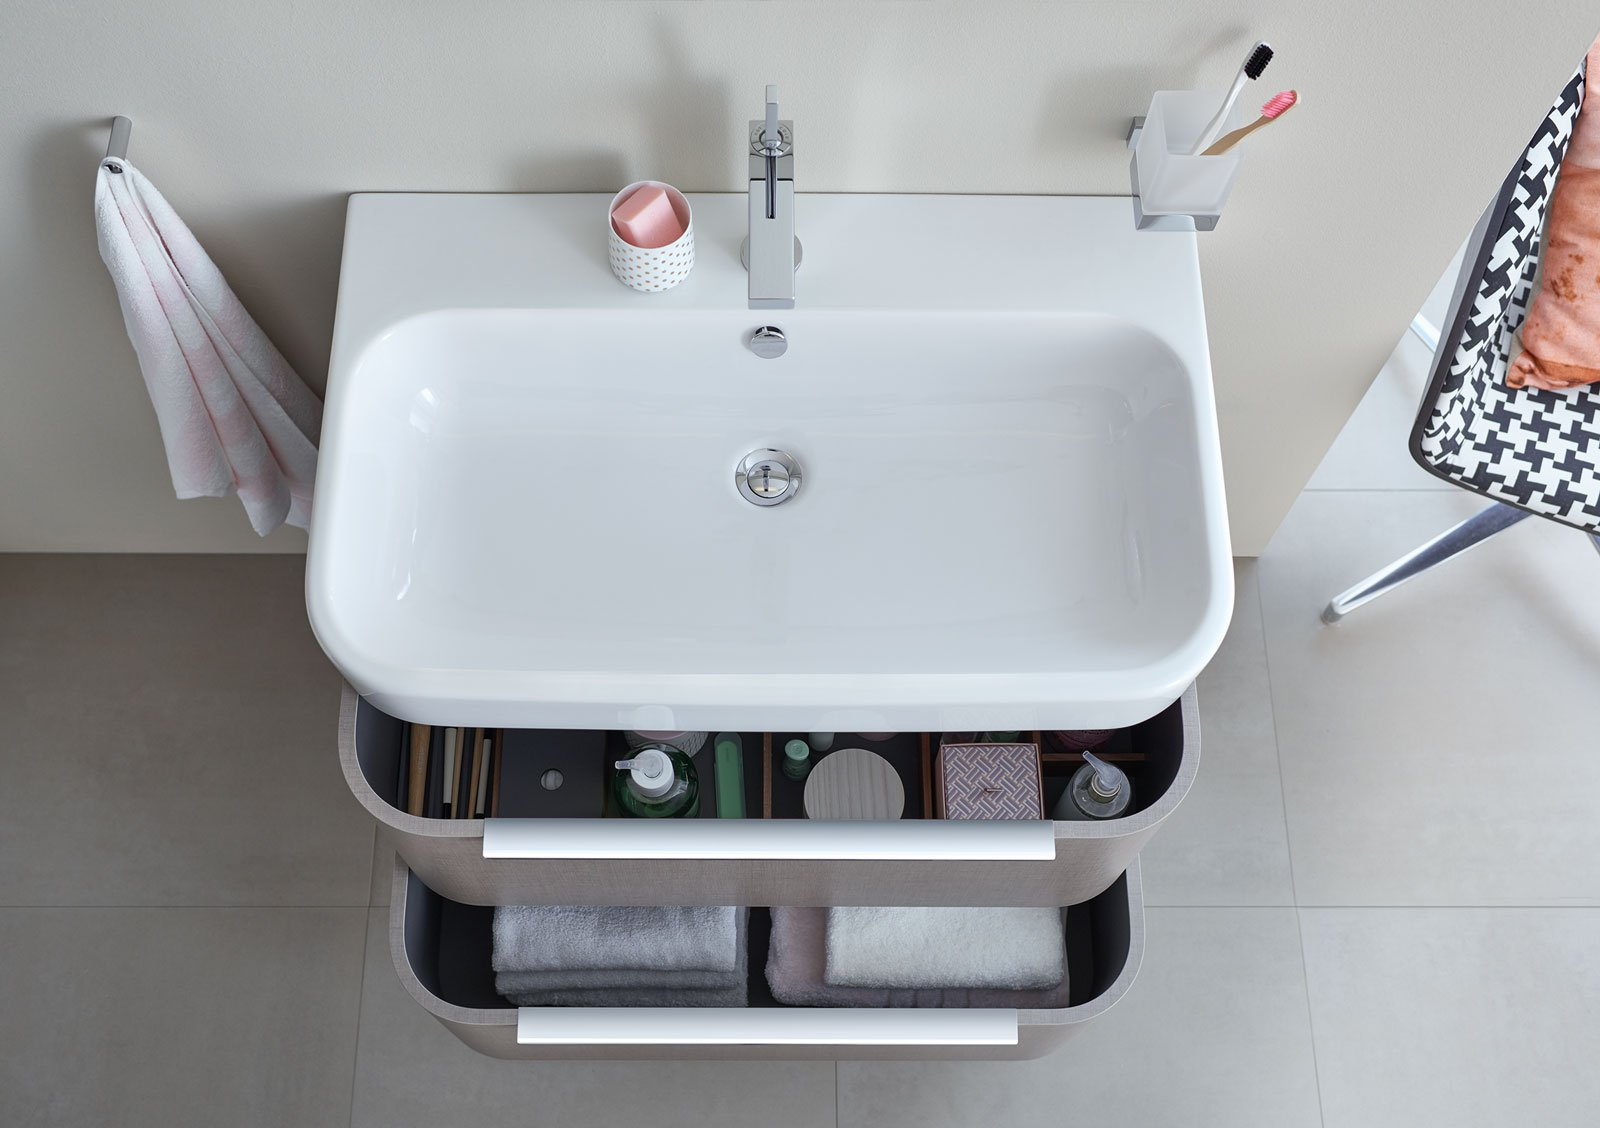 Accessori Bagno Duravit : Accessori bagno duravit. Arredo bagno ...